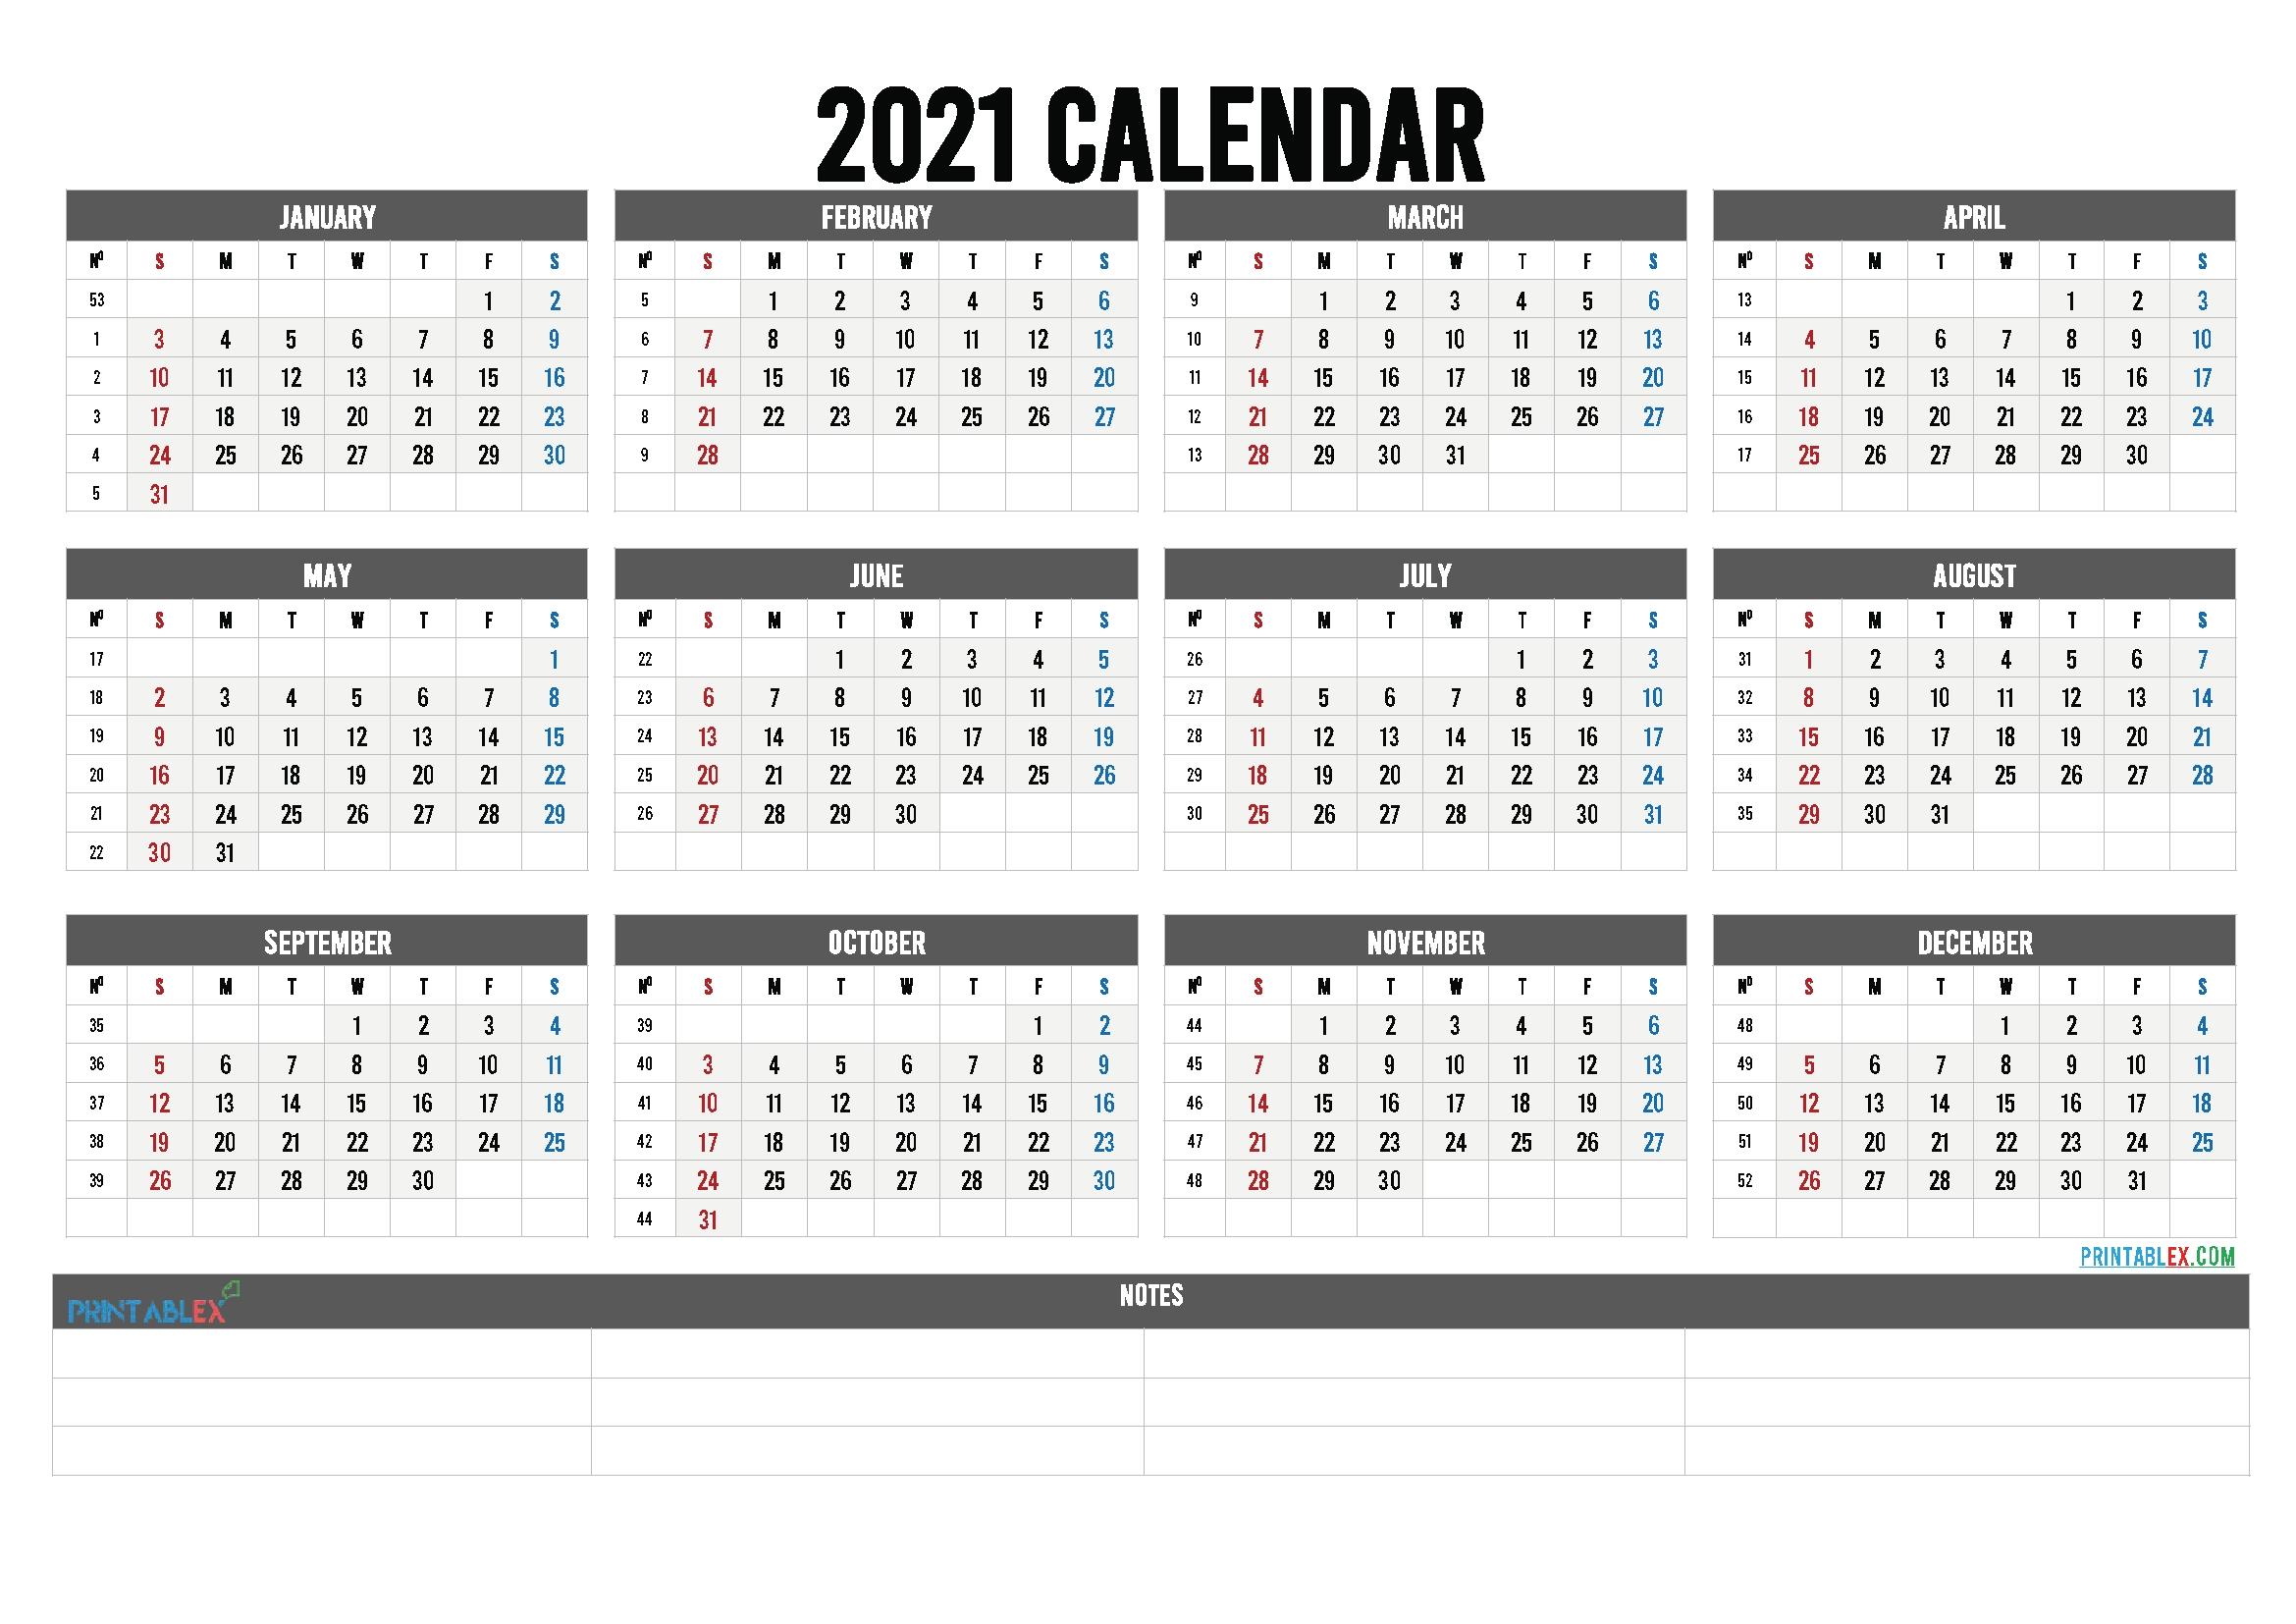 Free Printable 2021 Calendar Templates - 6 Templates - Free Printable Calendars intended for Calender 2021 To 2025 Photo